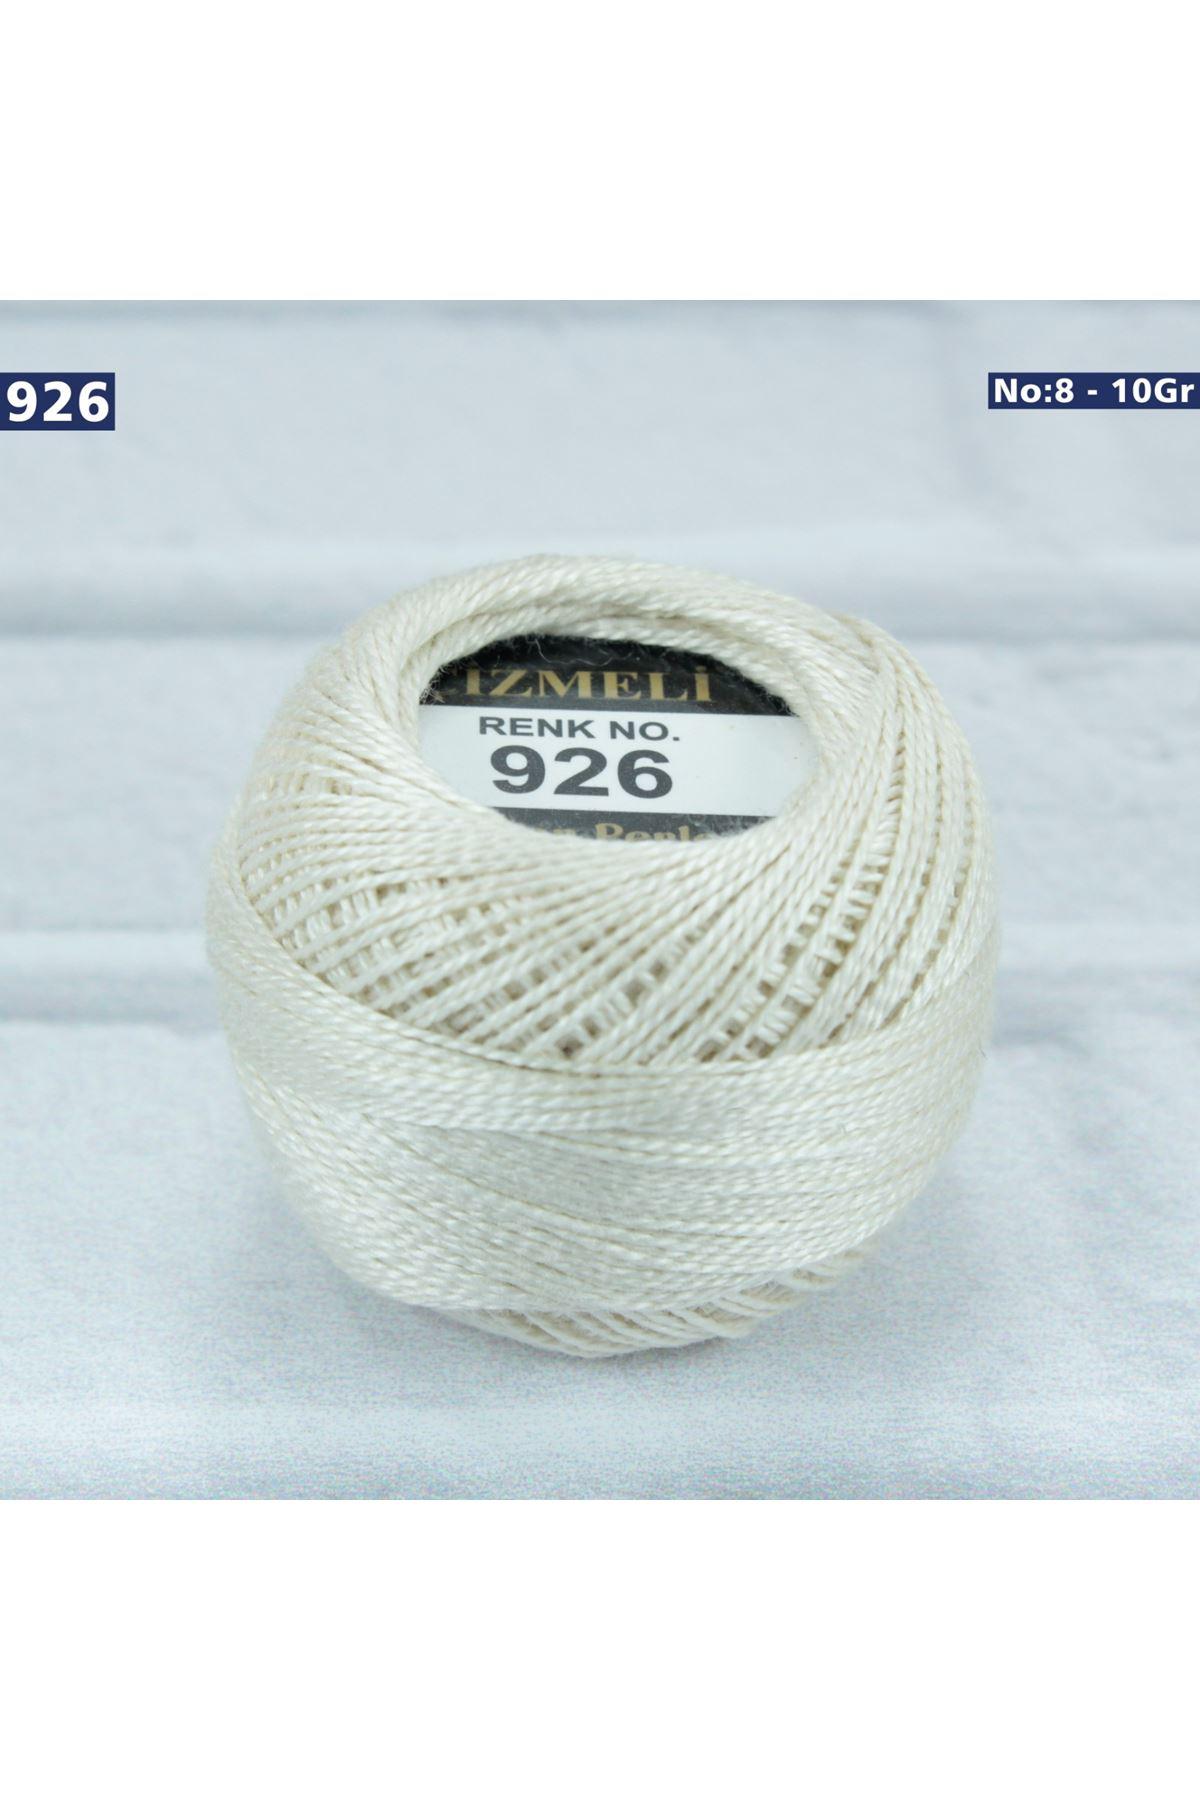 Çizmeli Cotton Perle Nakış İpliği No: 926